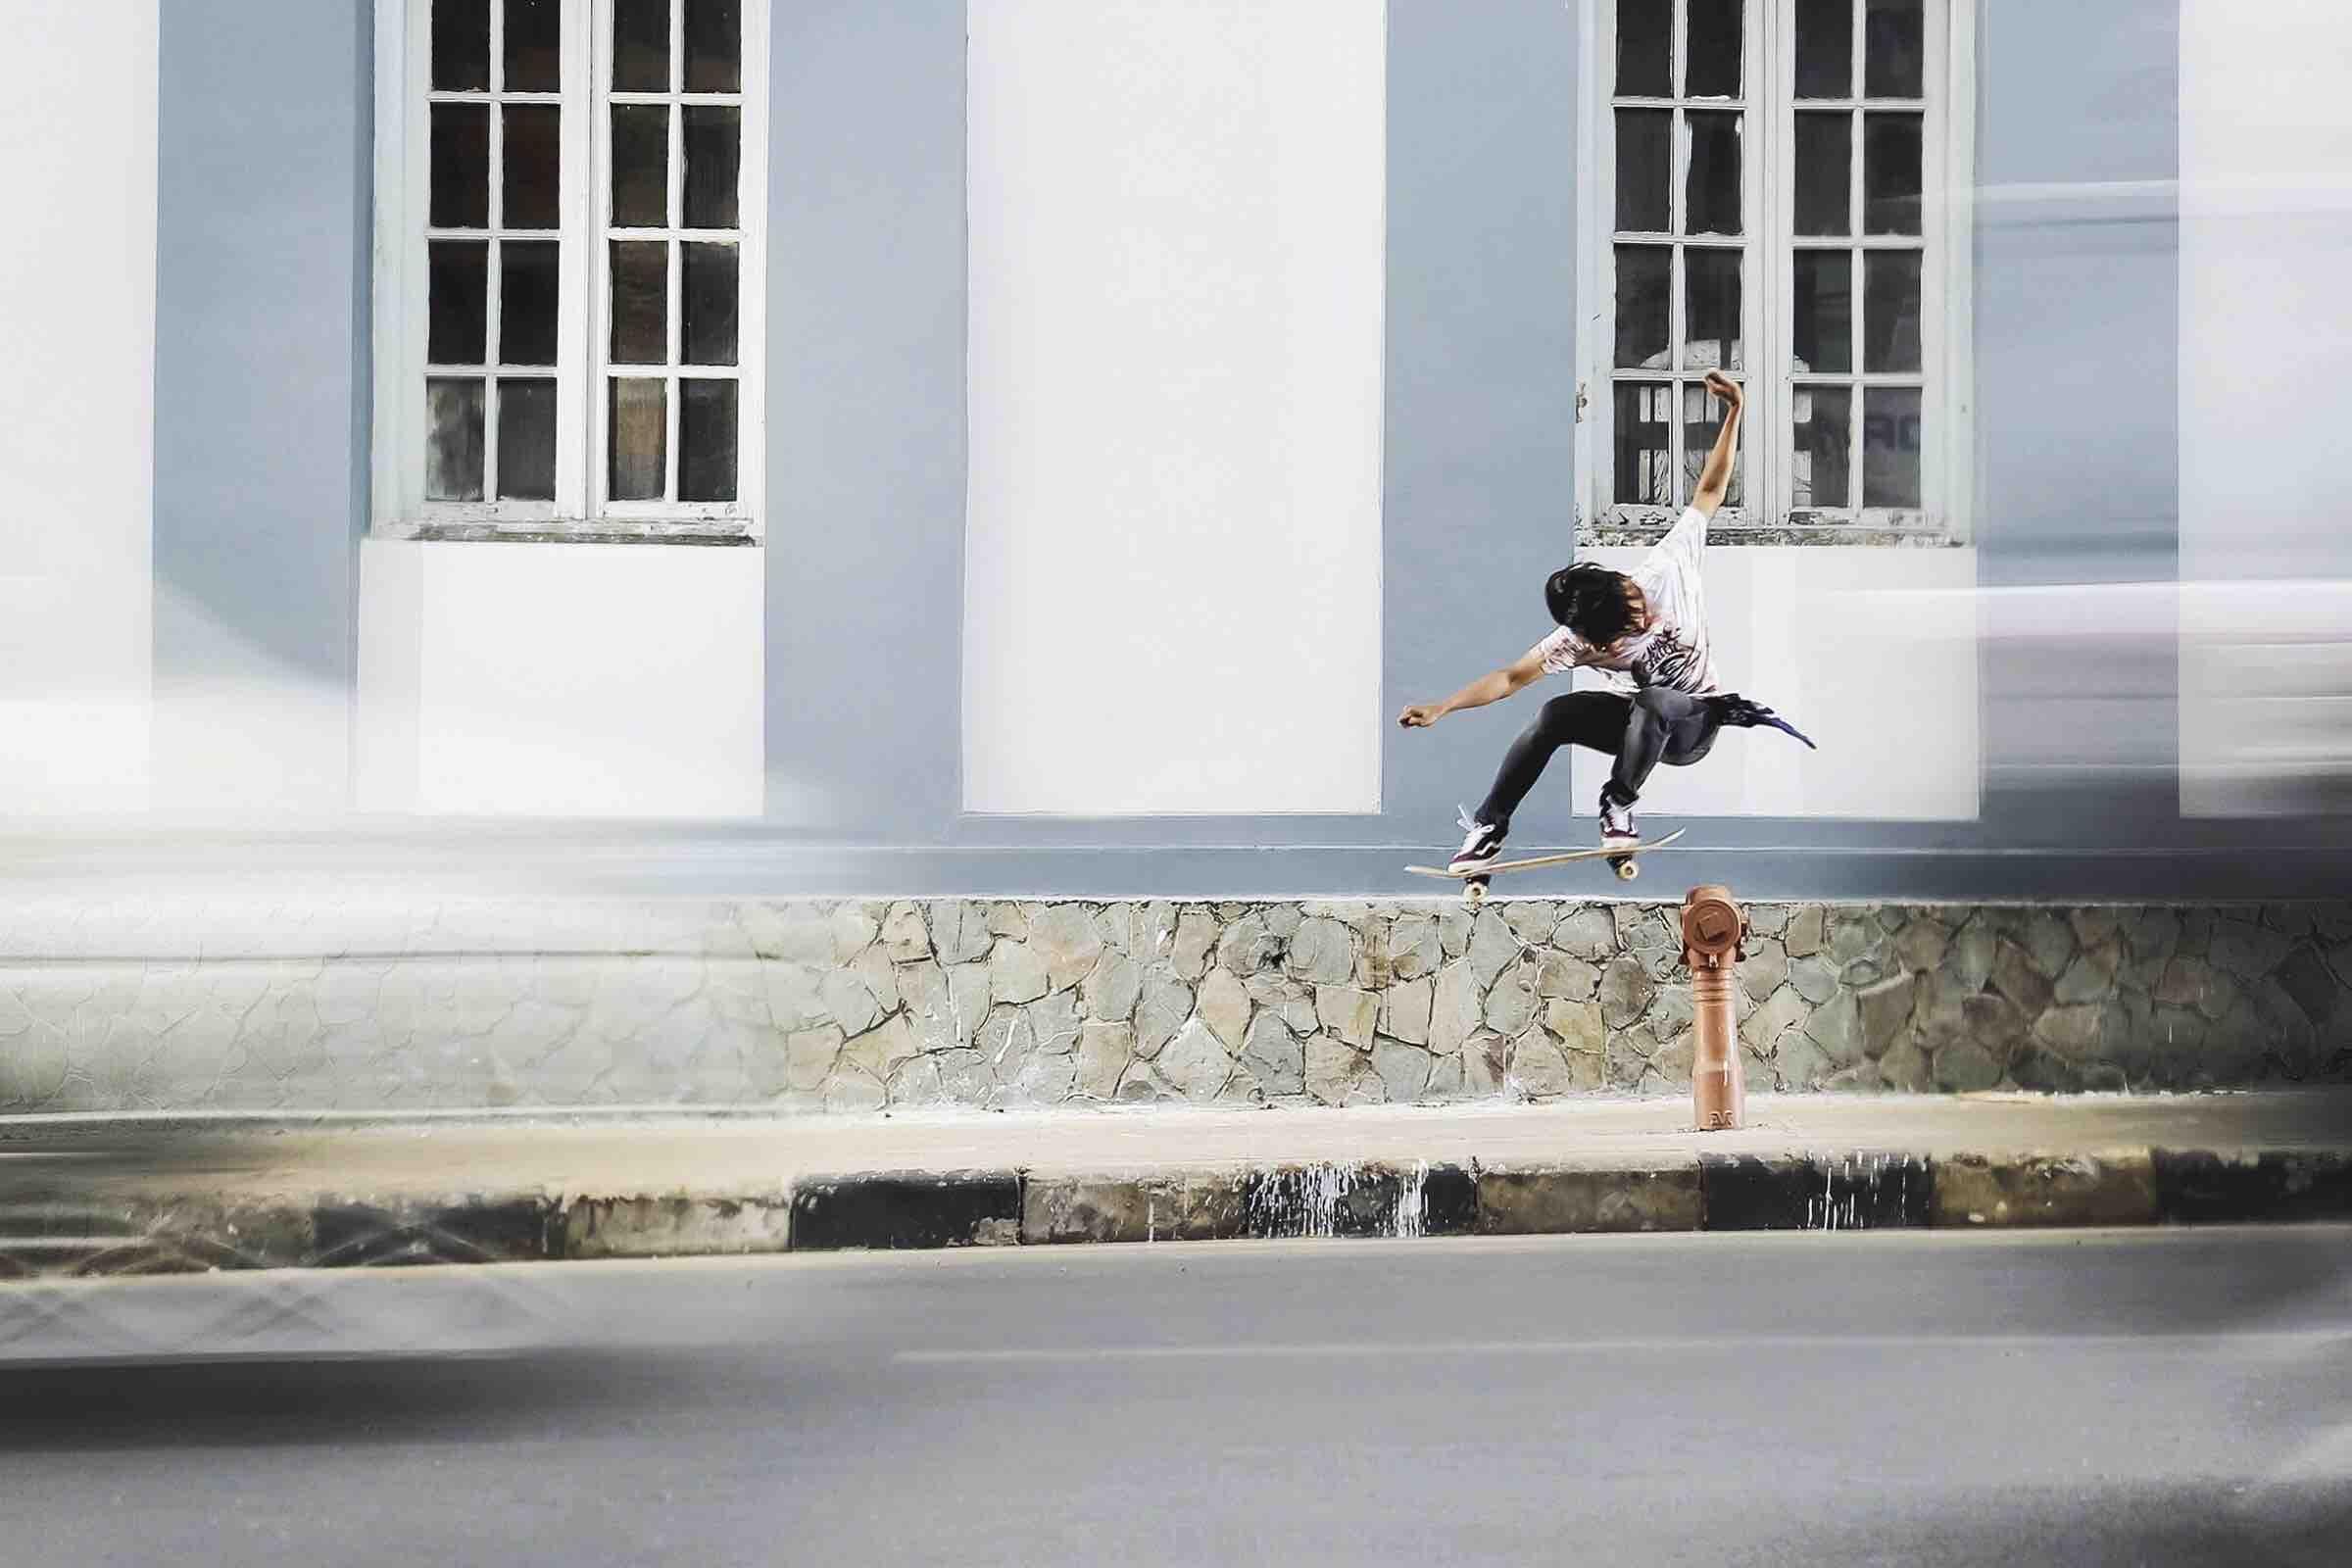 Skateboarder doing a skate trip on a city street